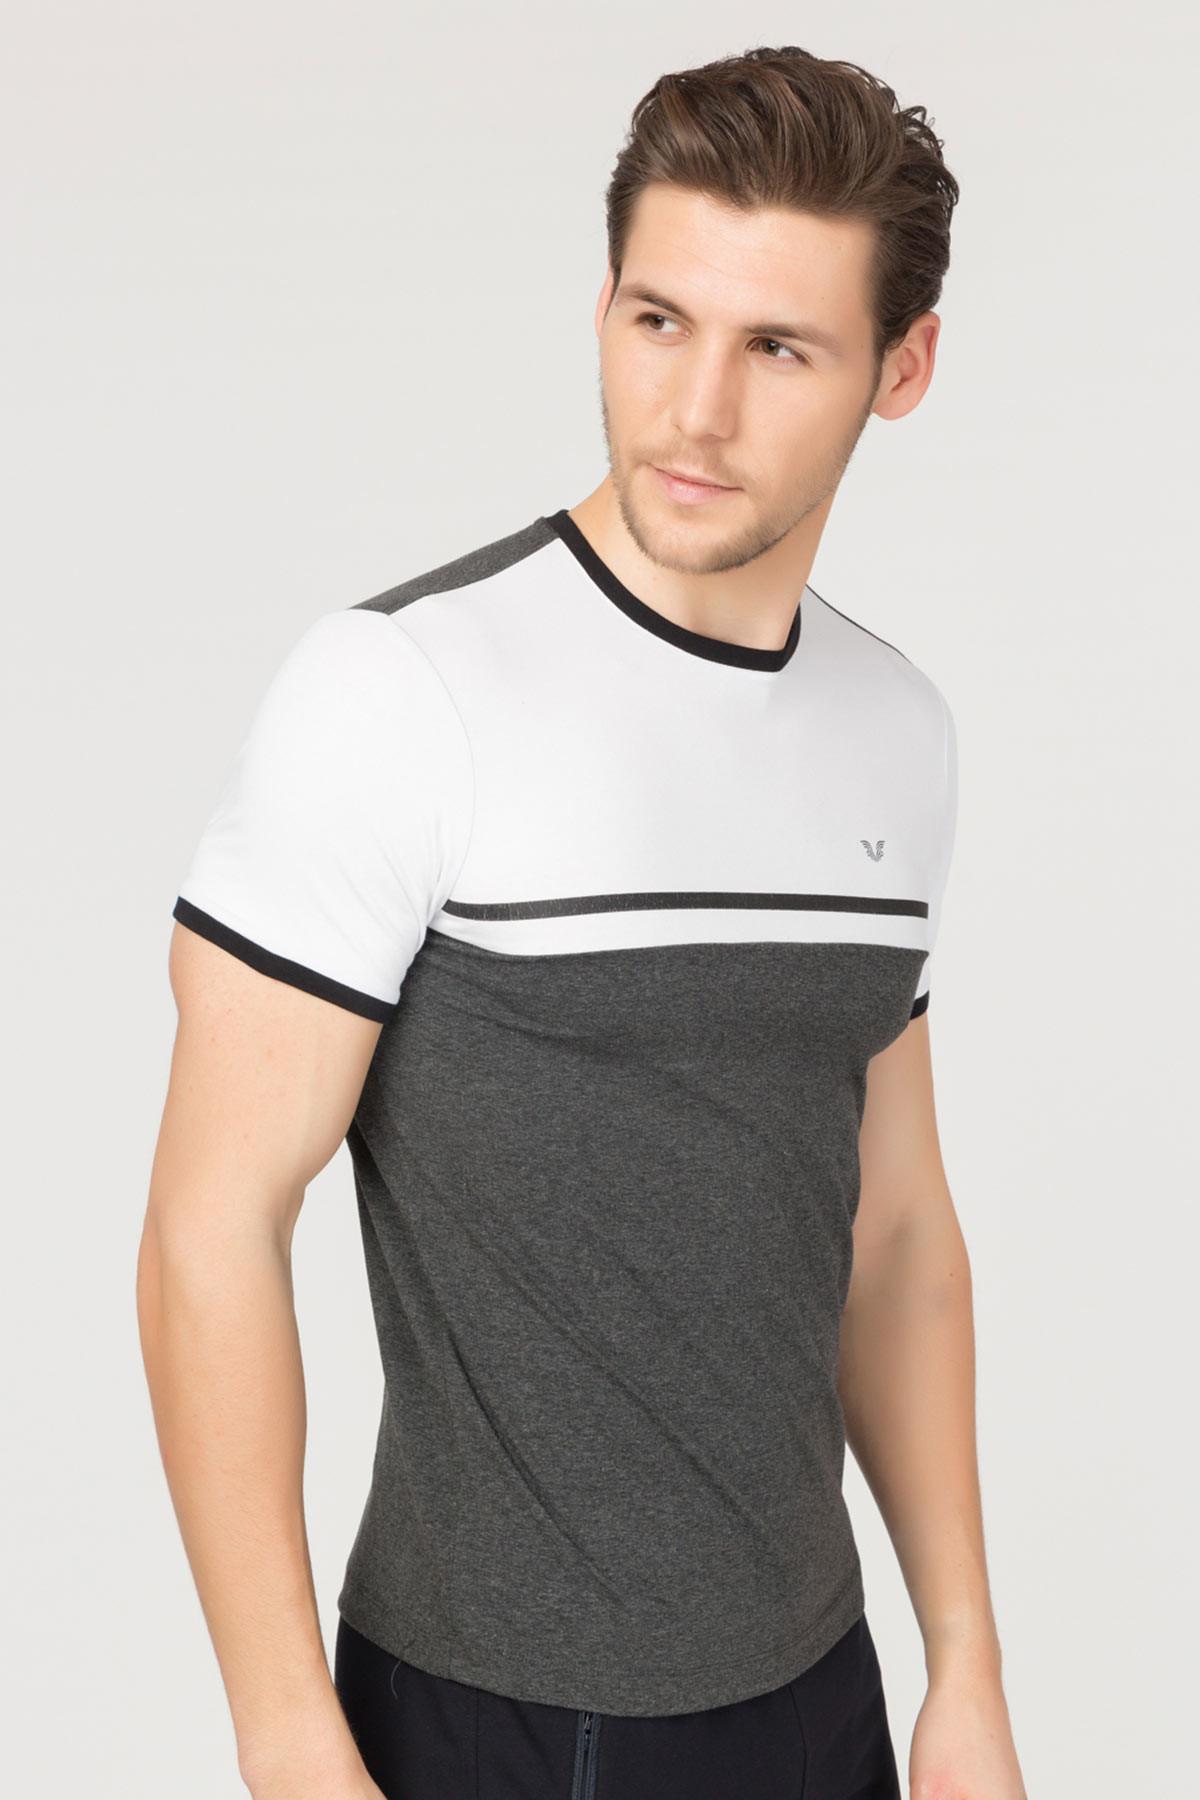 Bilcee Antrasit Pamuklu Erkek T-Shirt FS-1762 BİLCEE